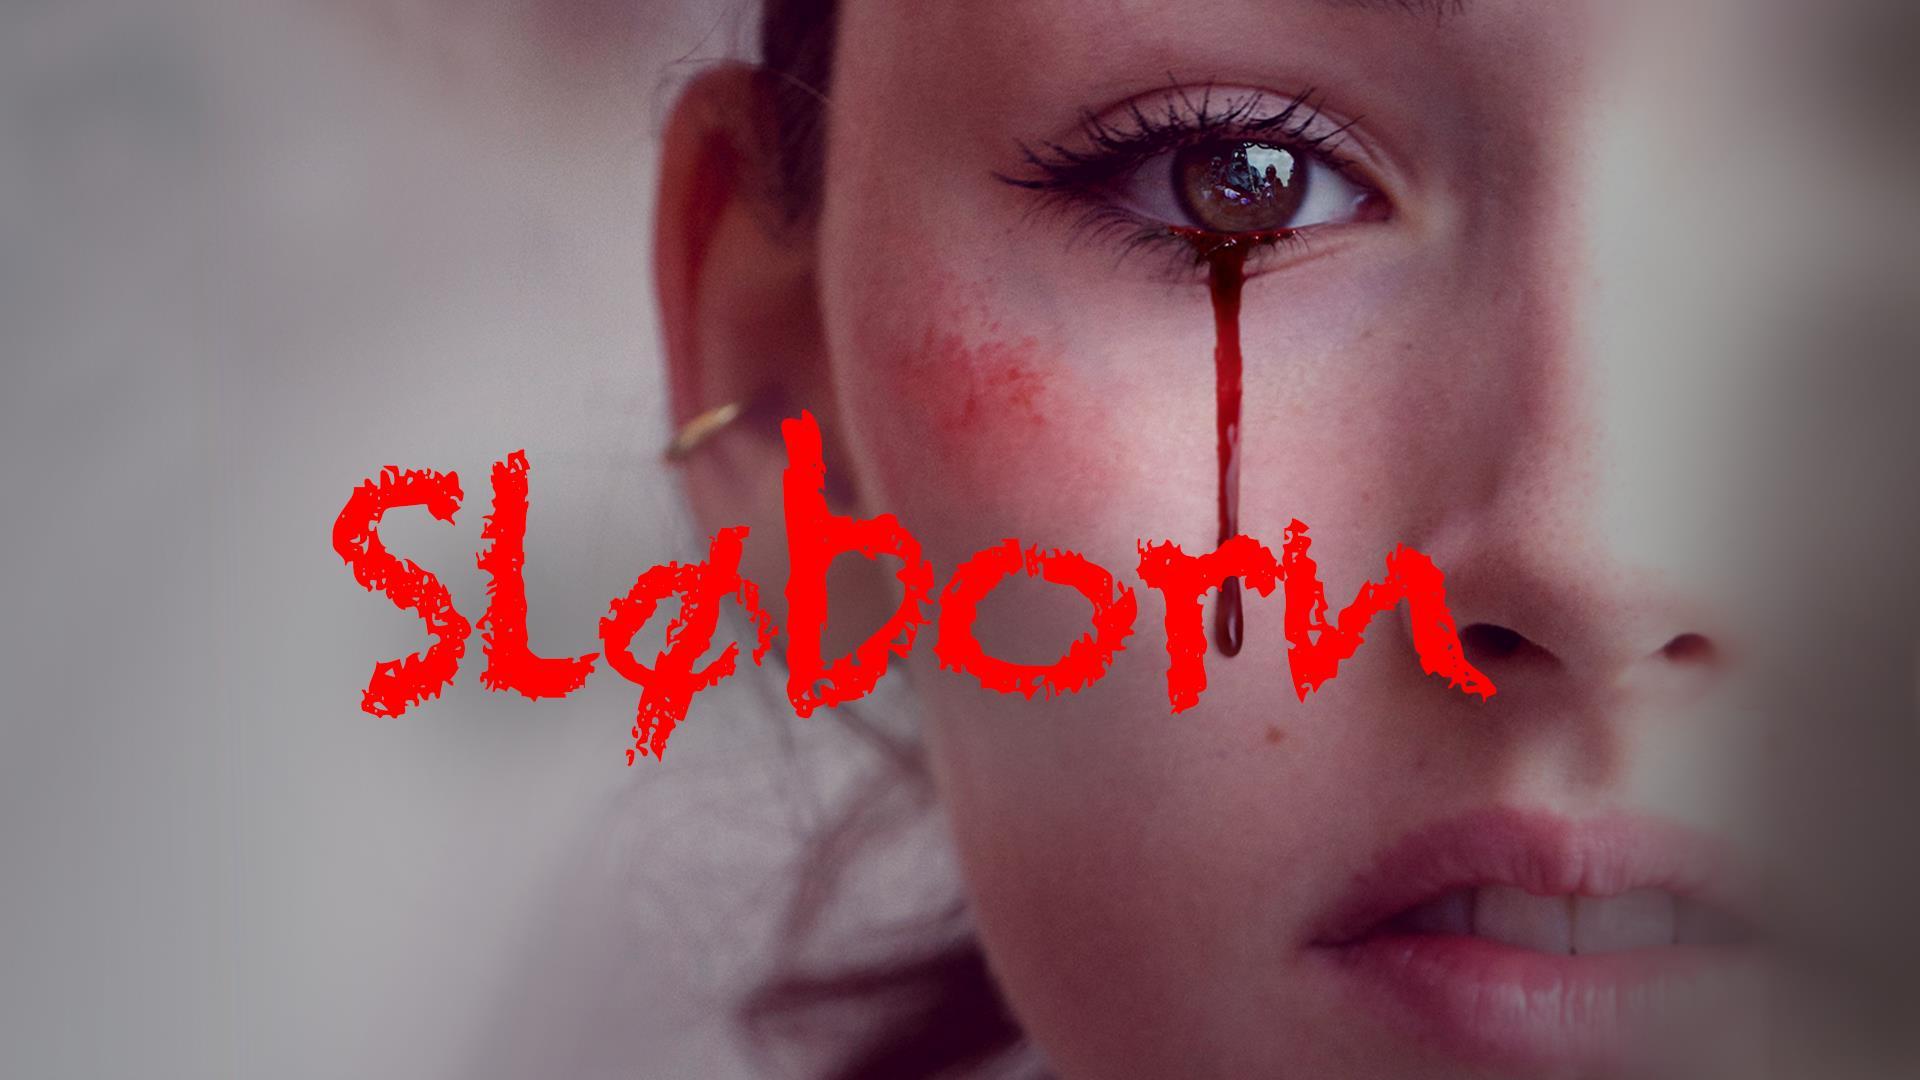 SLOBORN